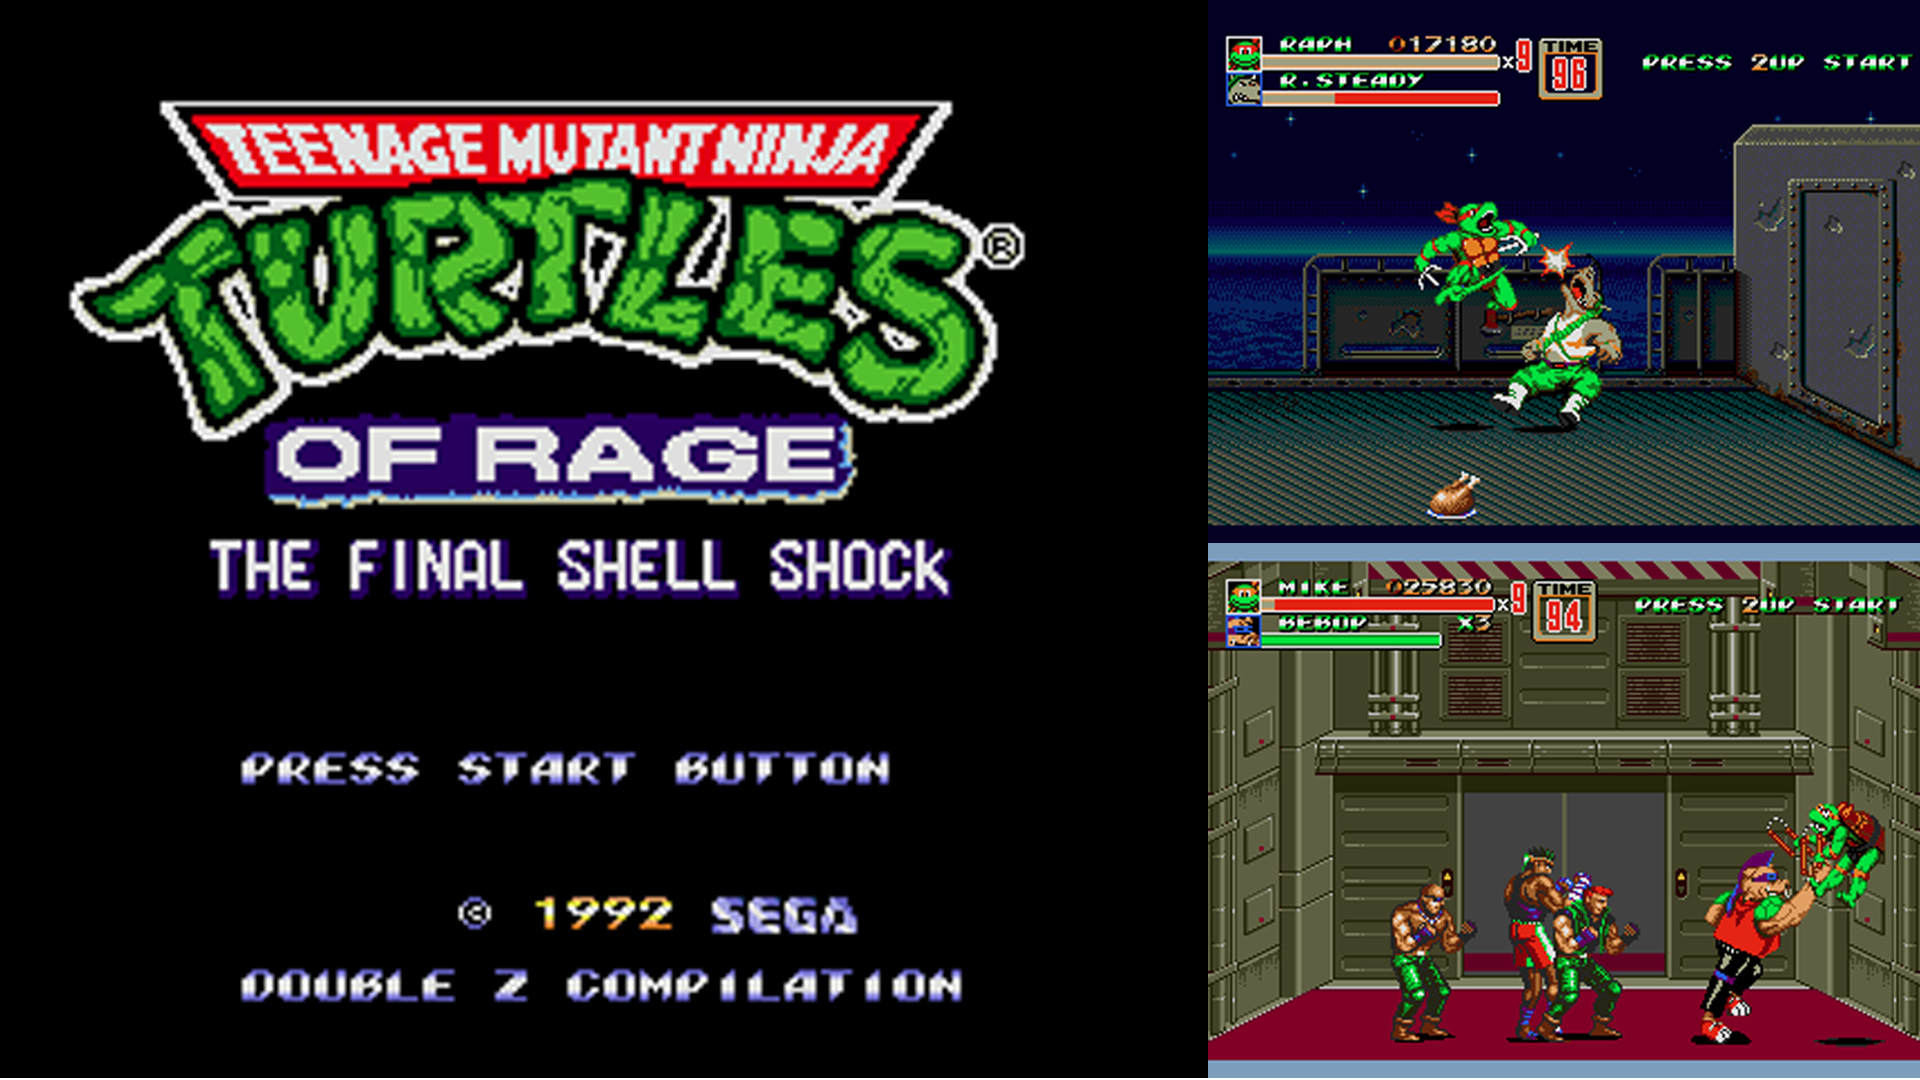 Tmnt Of Rage The Final Shell Shock The Ultimate Streets Of Rage Tmnt Rom Hack Arrives Segabits 1 Source For Sega News